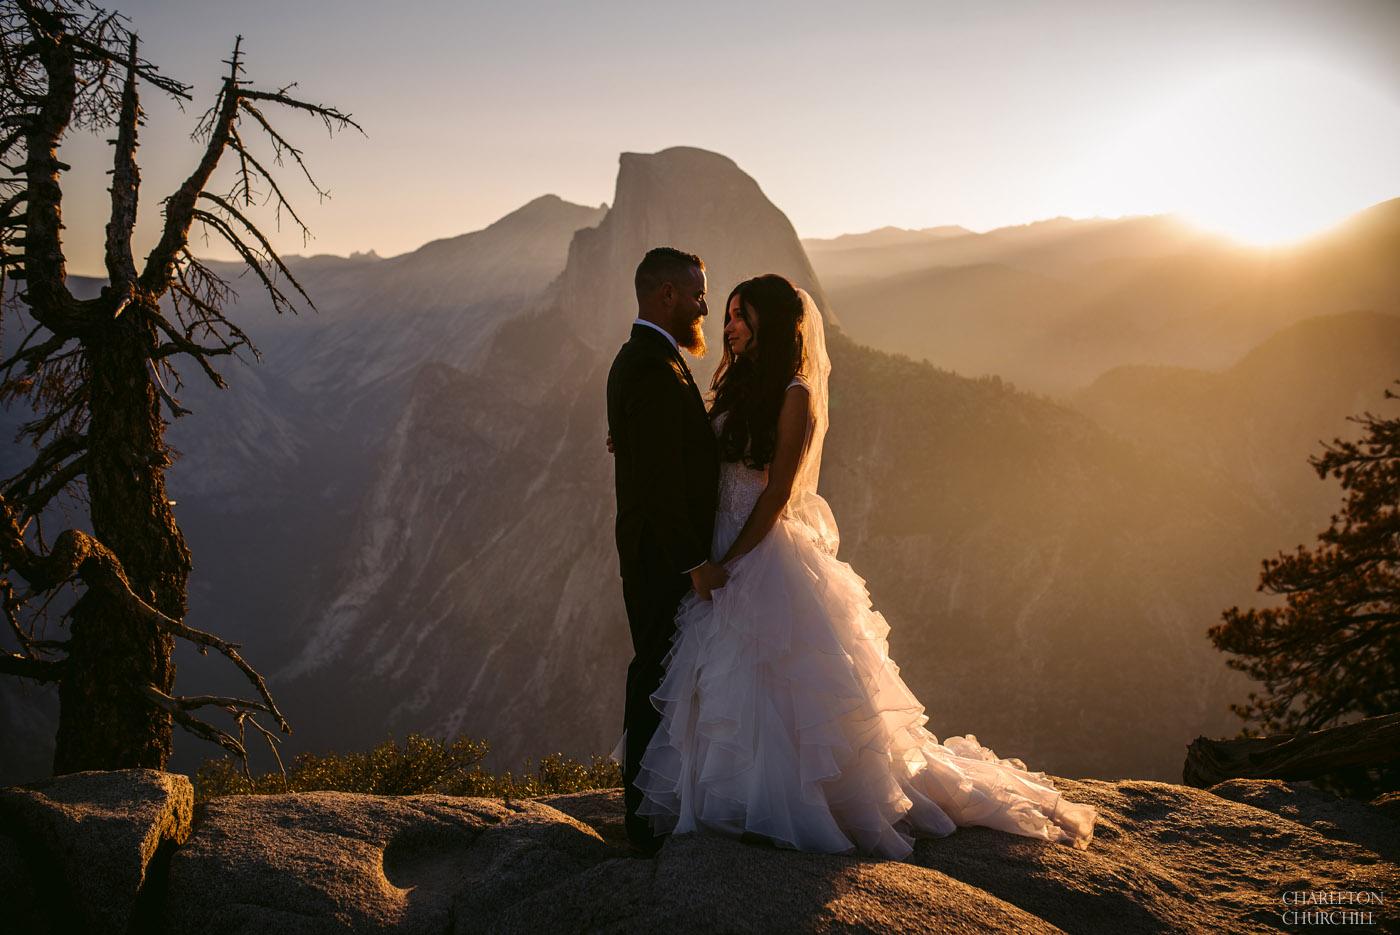 adventure wedding photography in Yosemite National Park